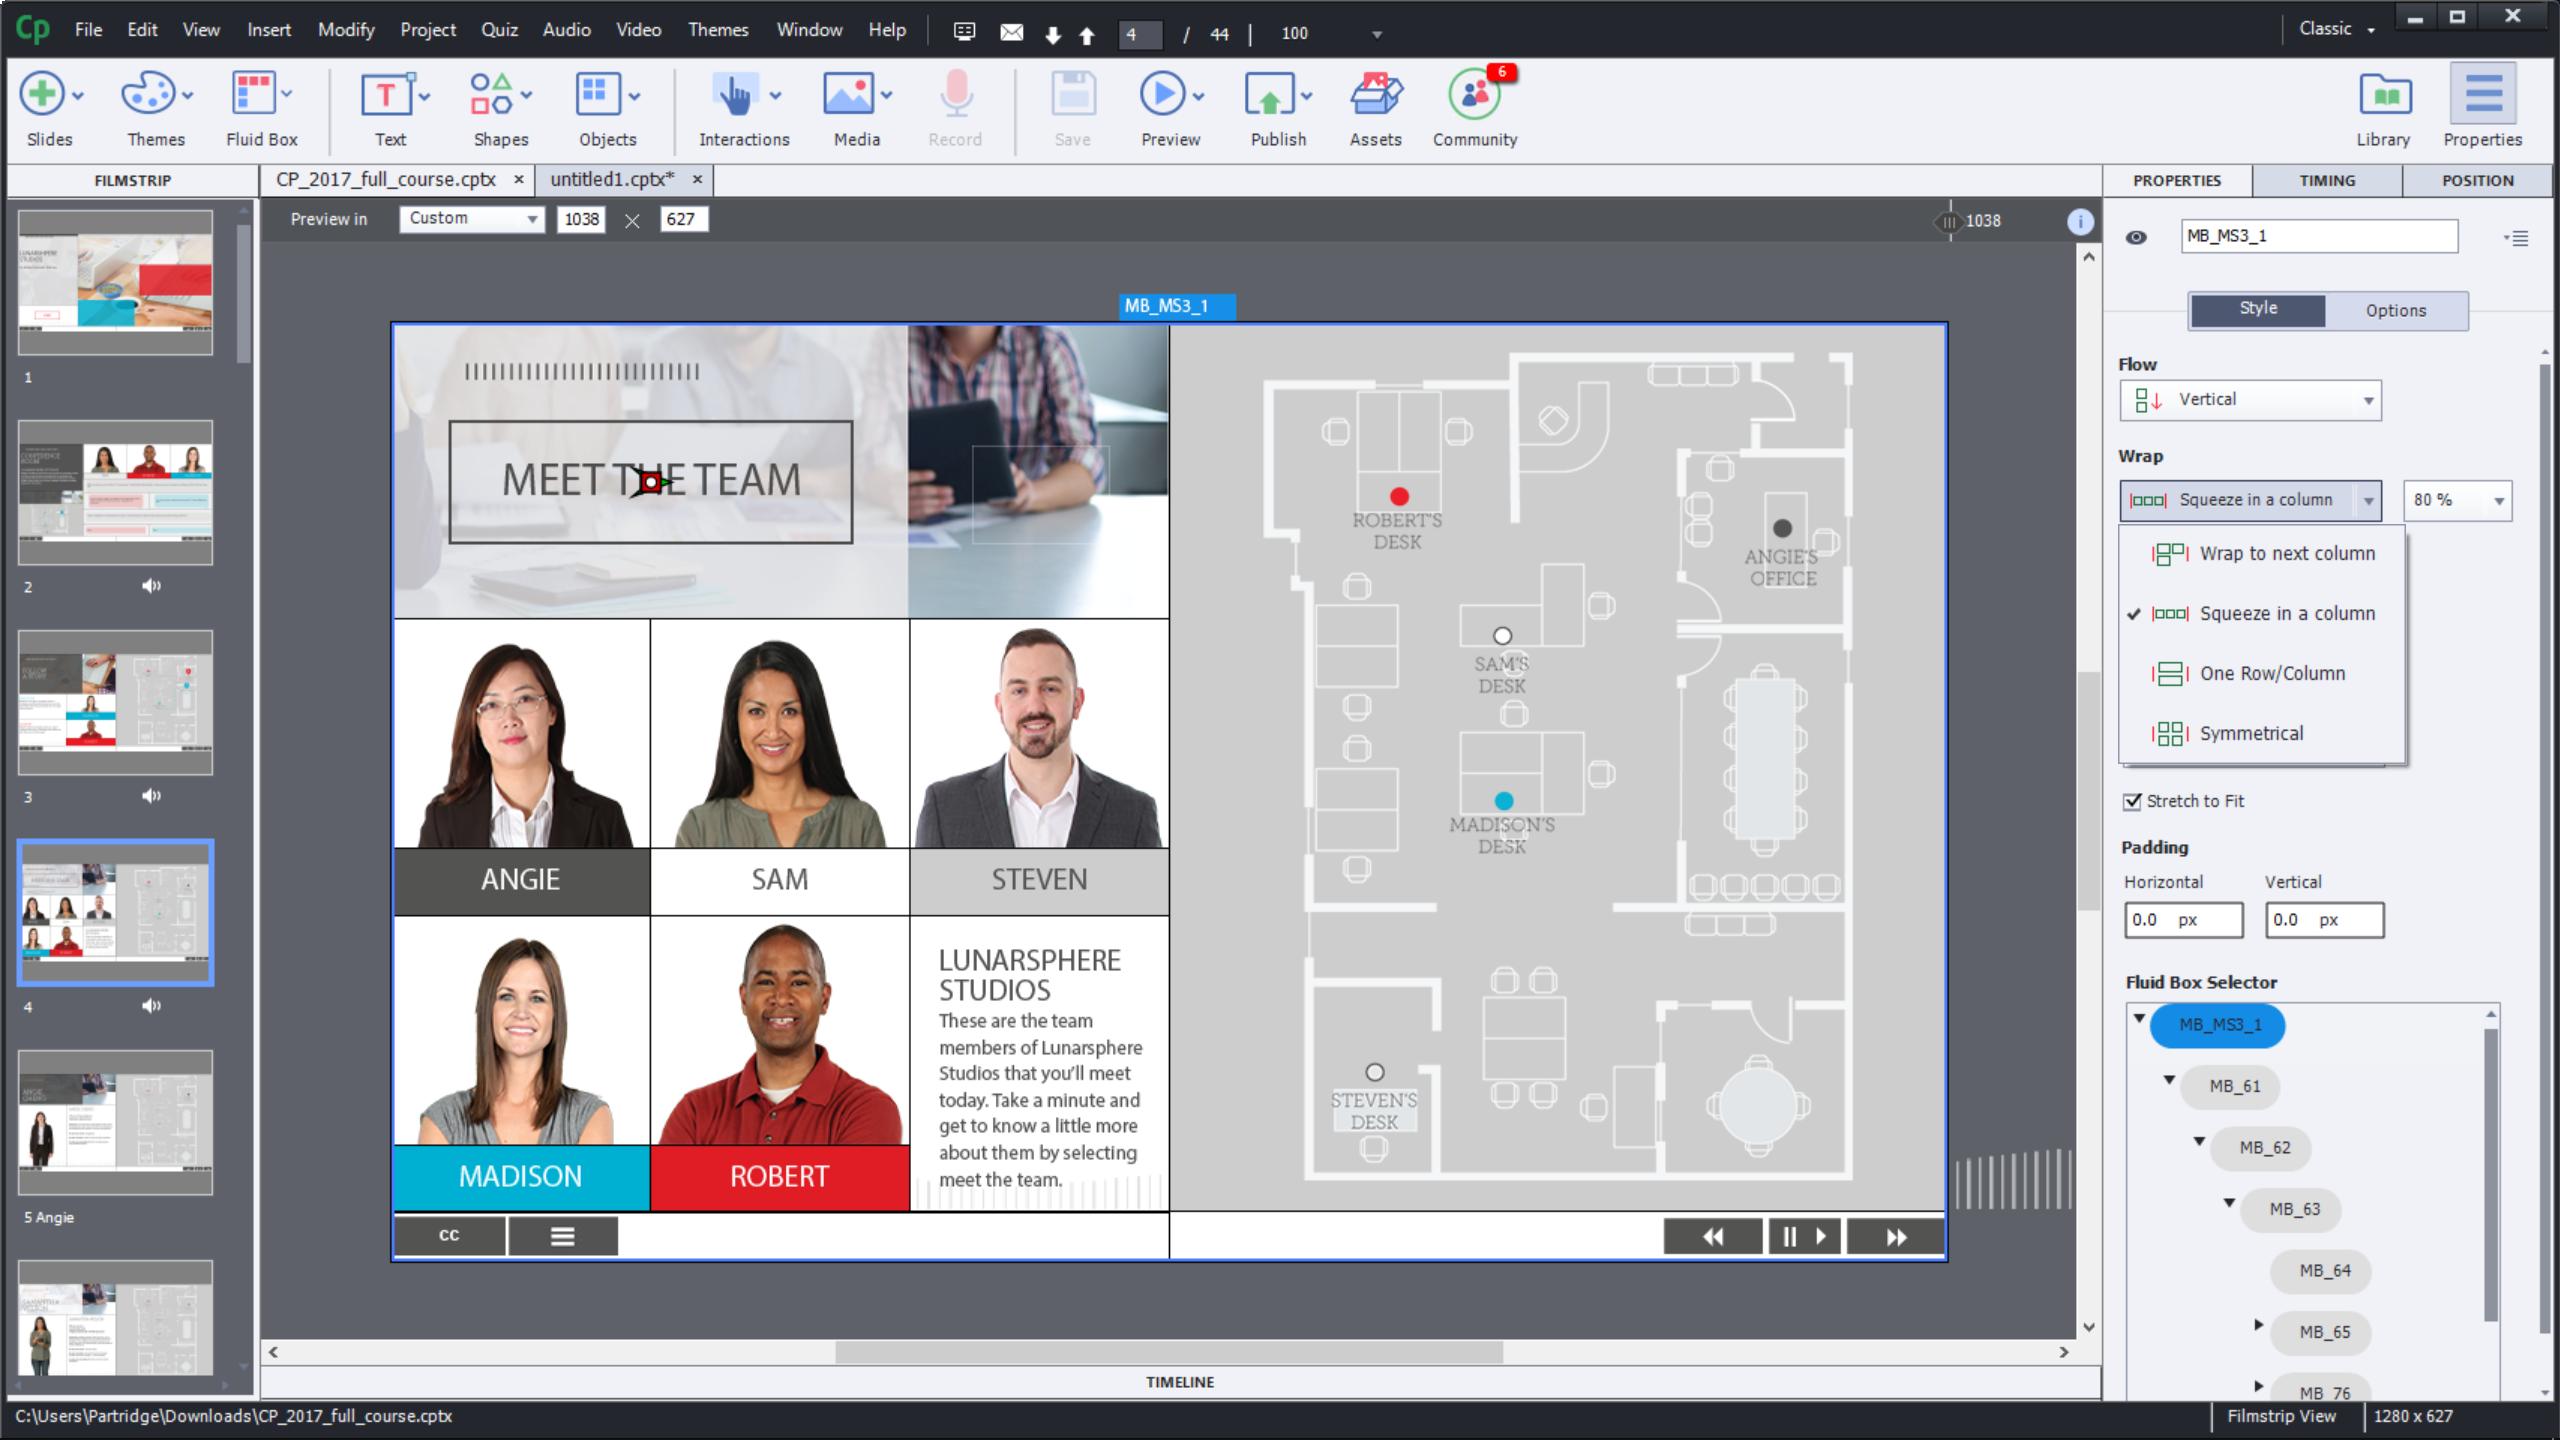 Adobe Captivate 2017 Release